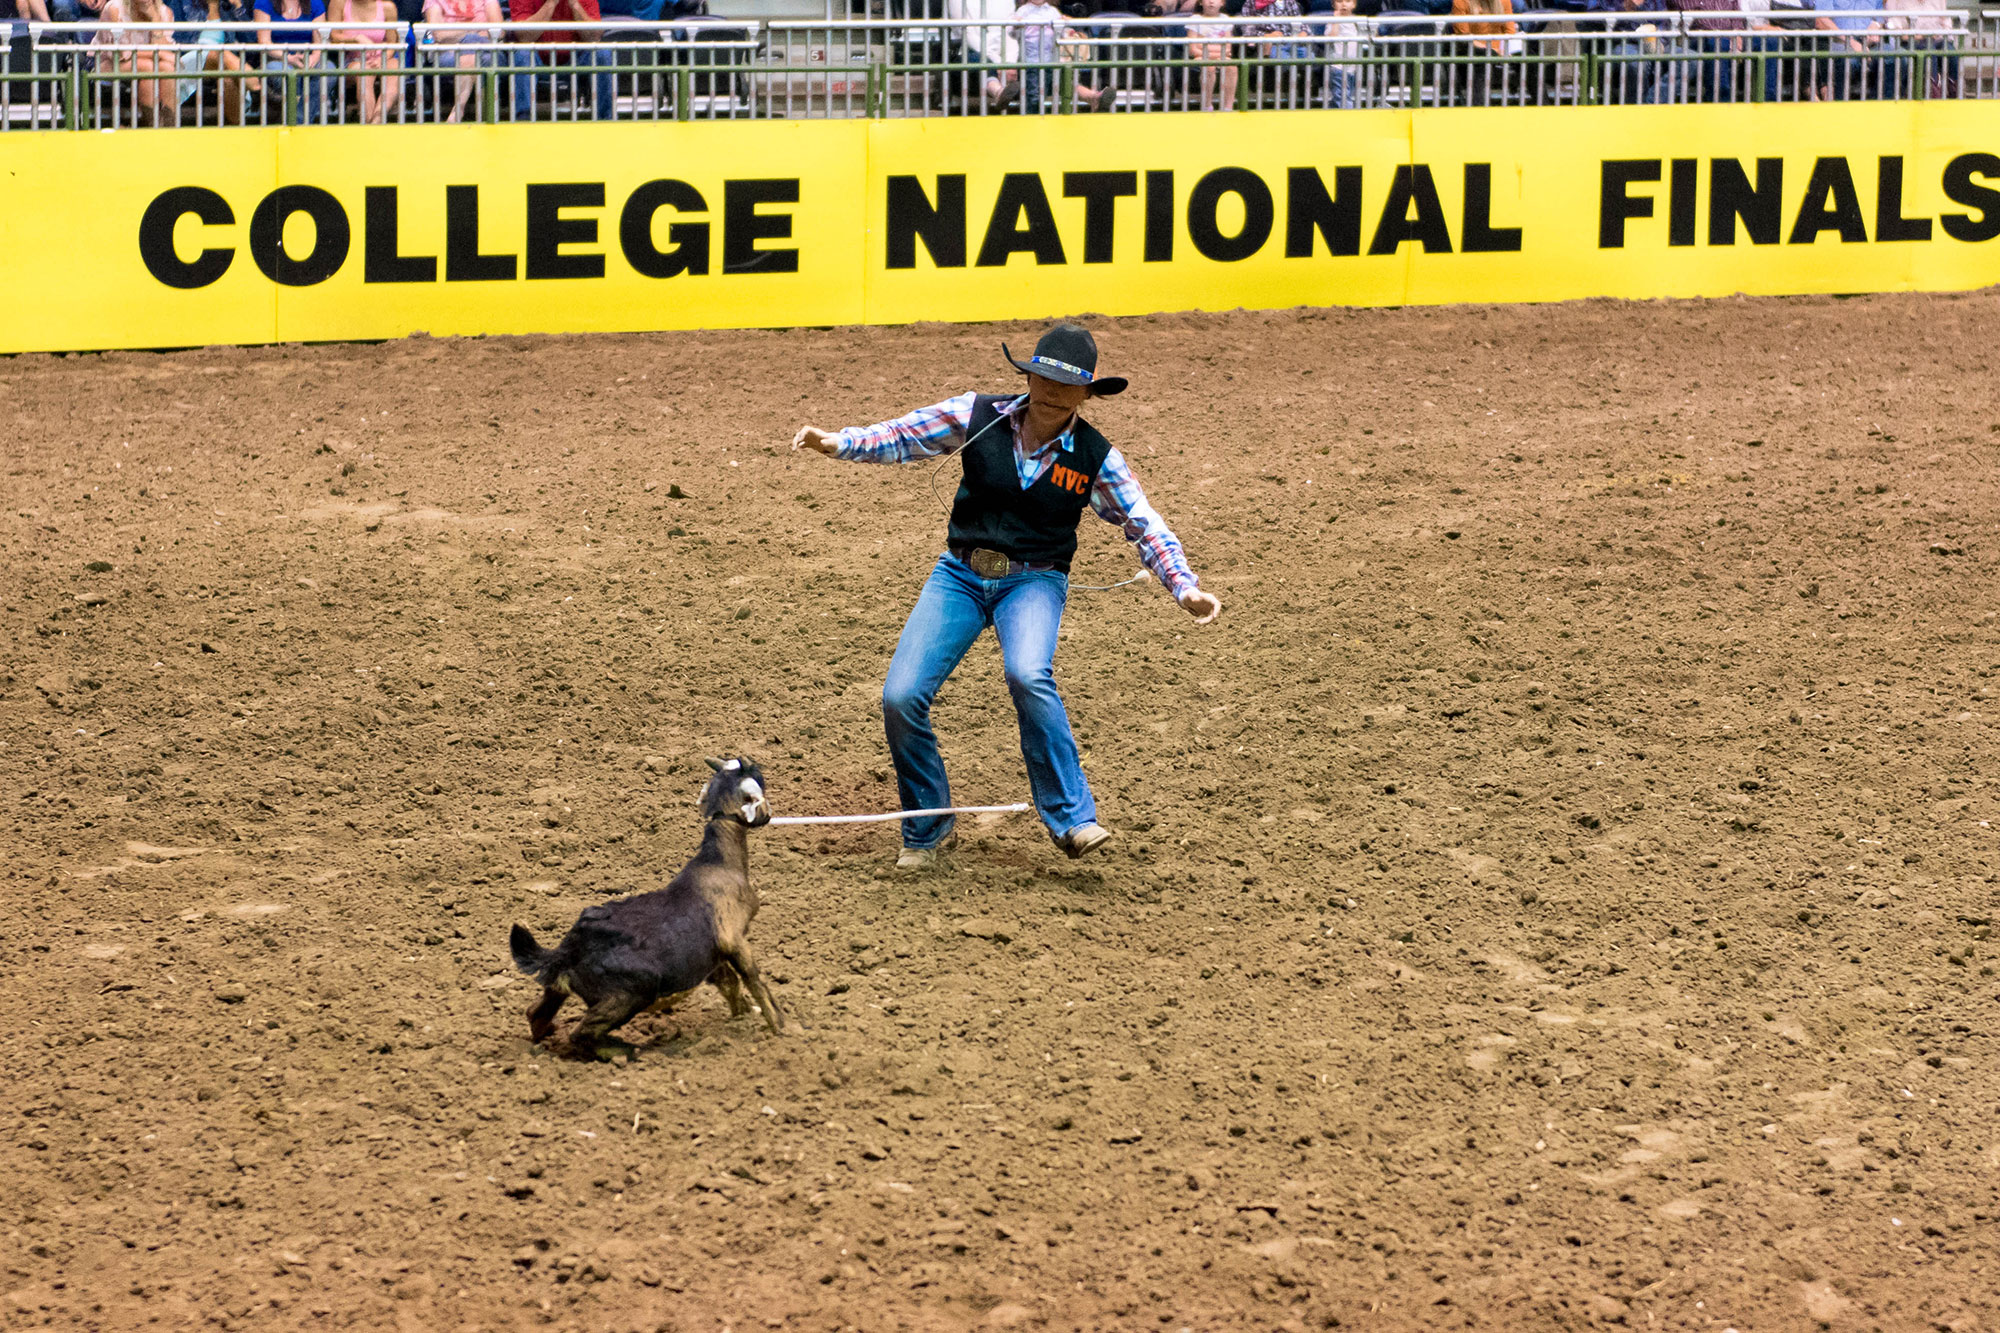 College National Finals Rodeo Casper Wyoming